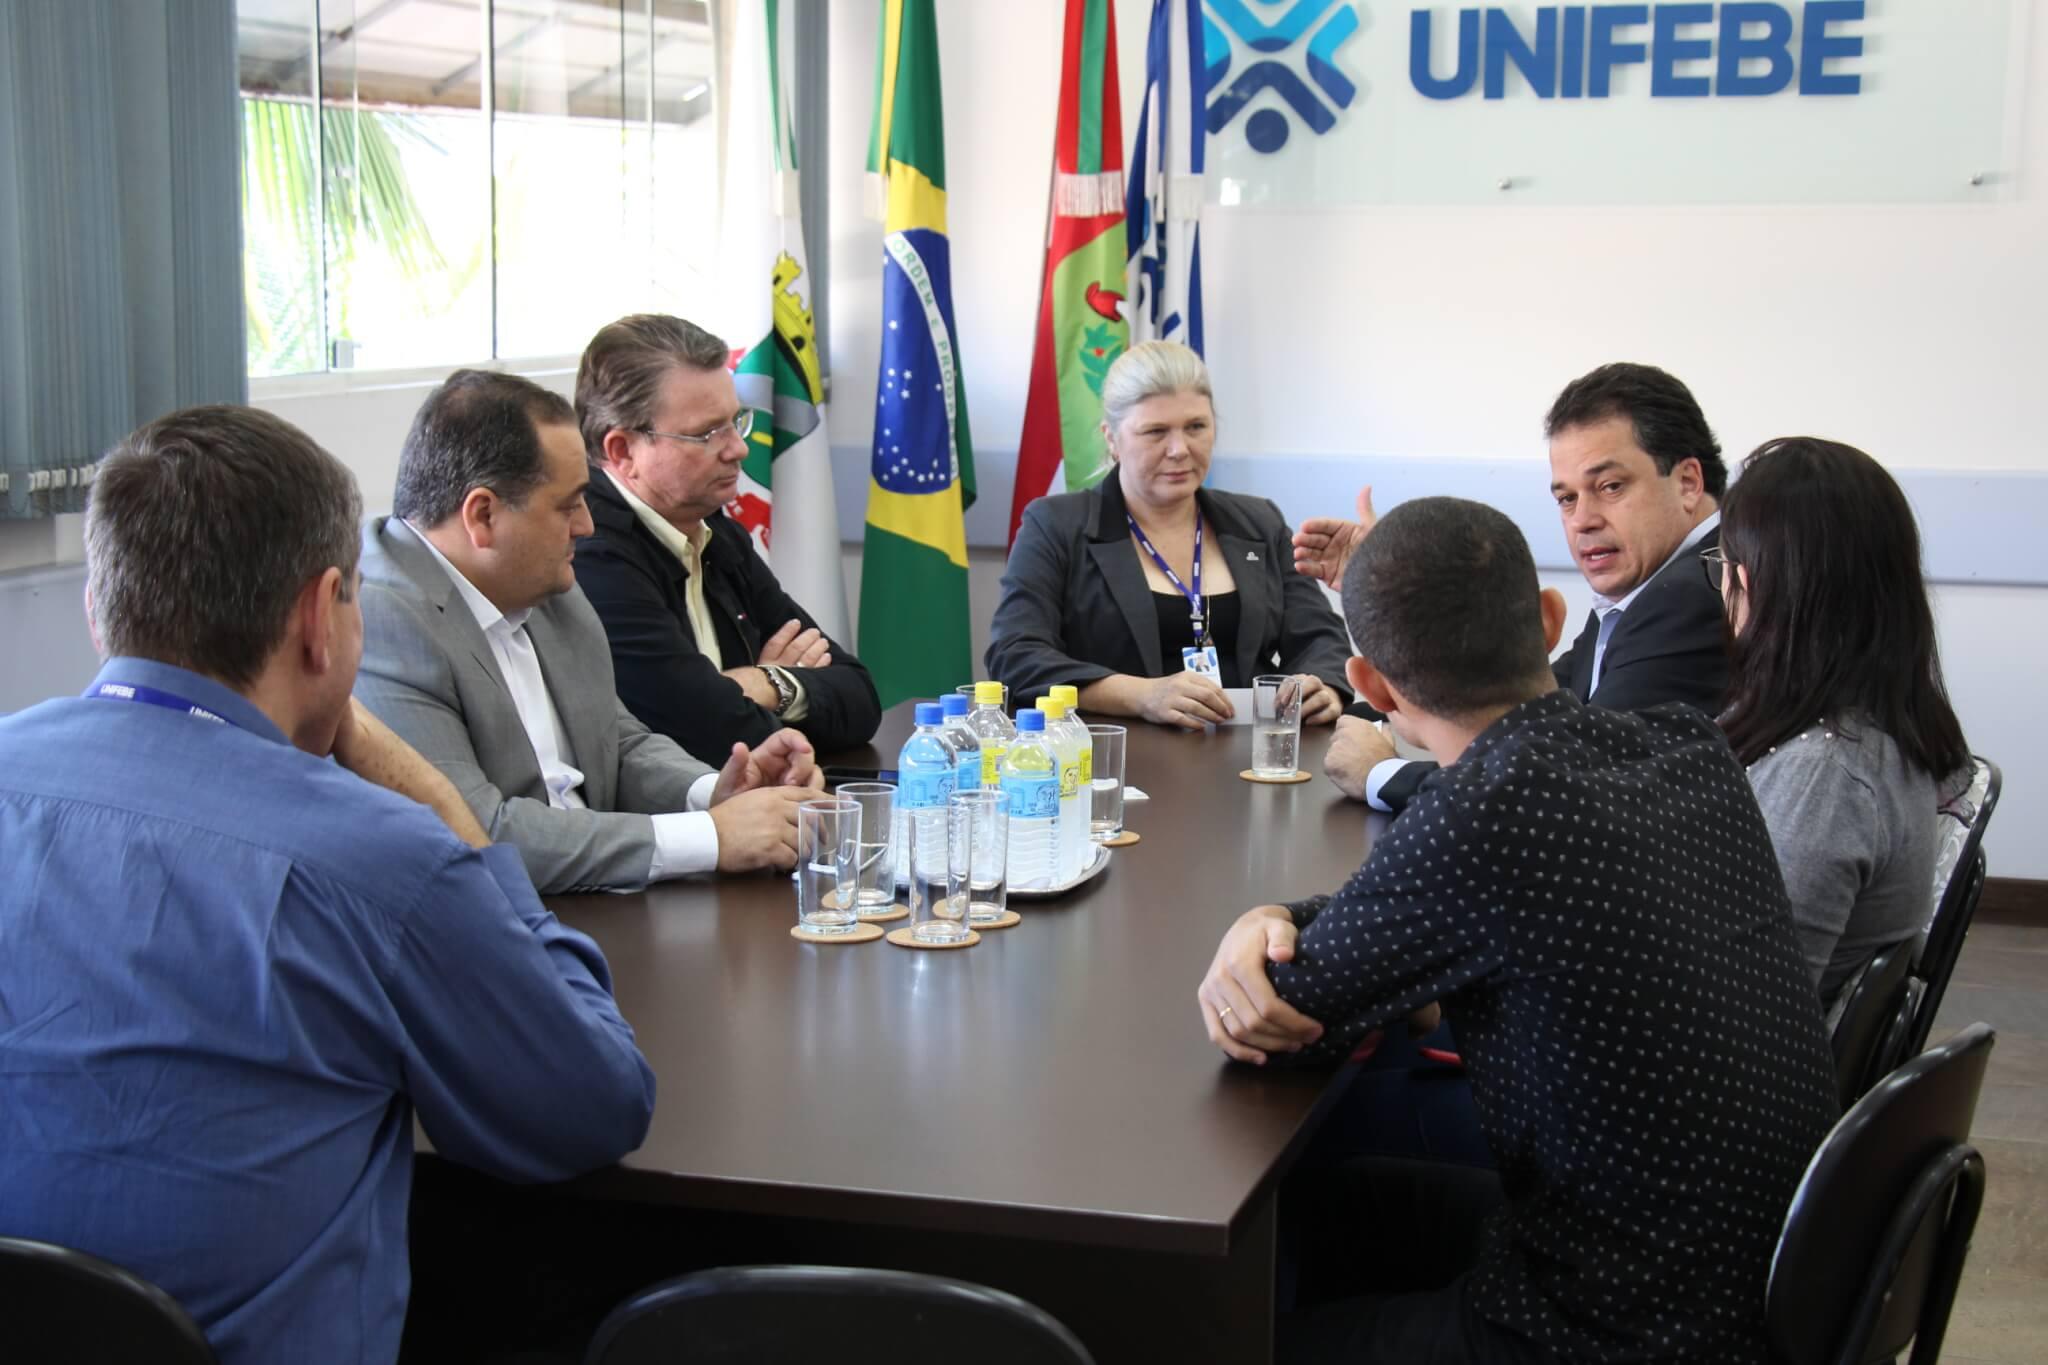 UNIFEBE recebe comitiva para tratar de repasse de verbas dos artigos 170 e 171